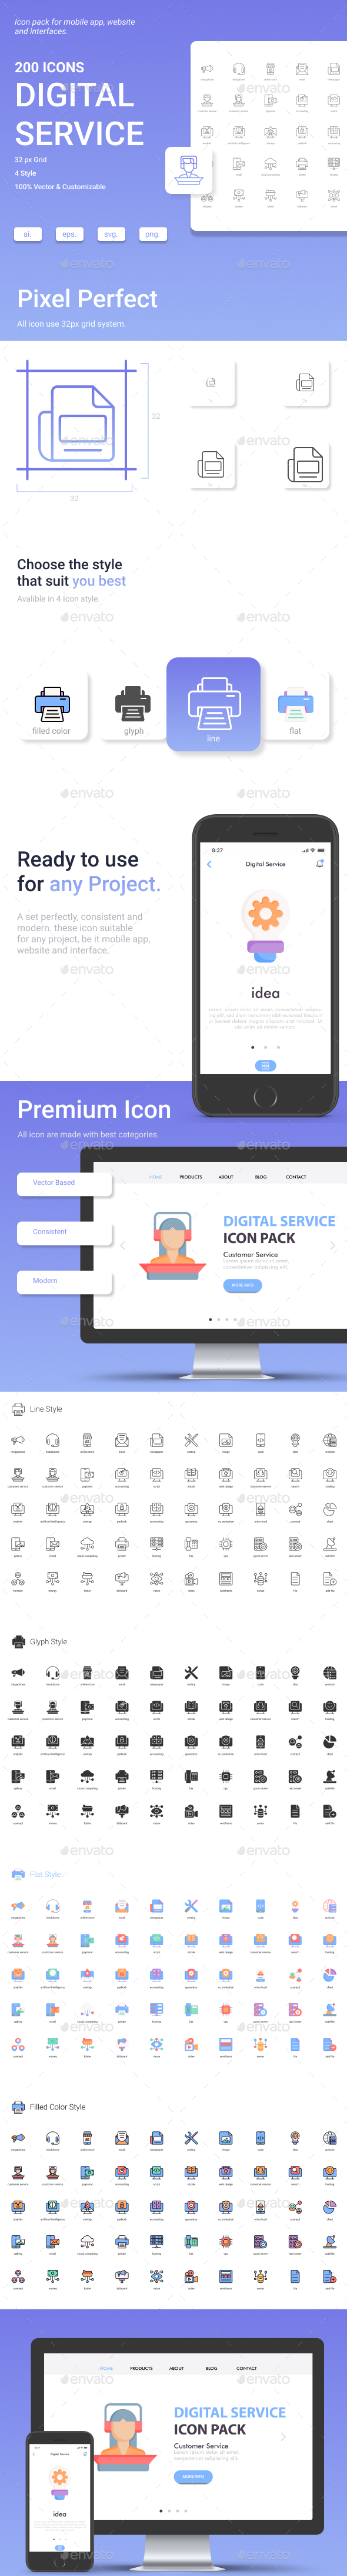 Digital Service Icon Set.